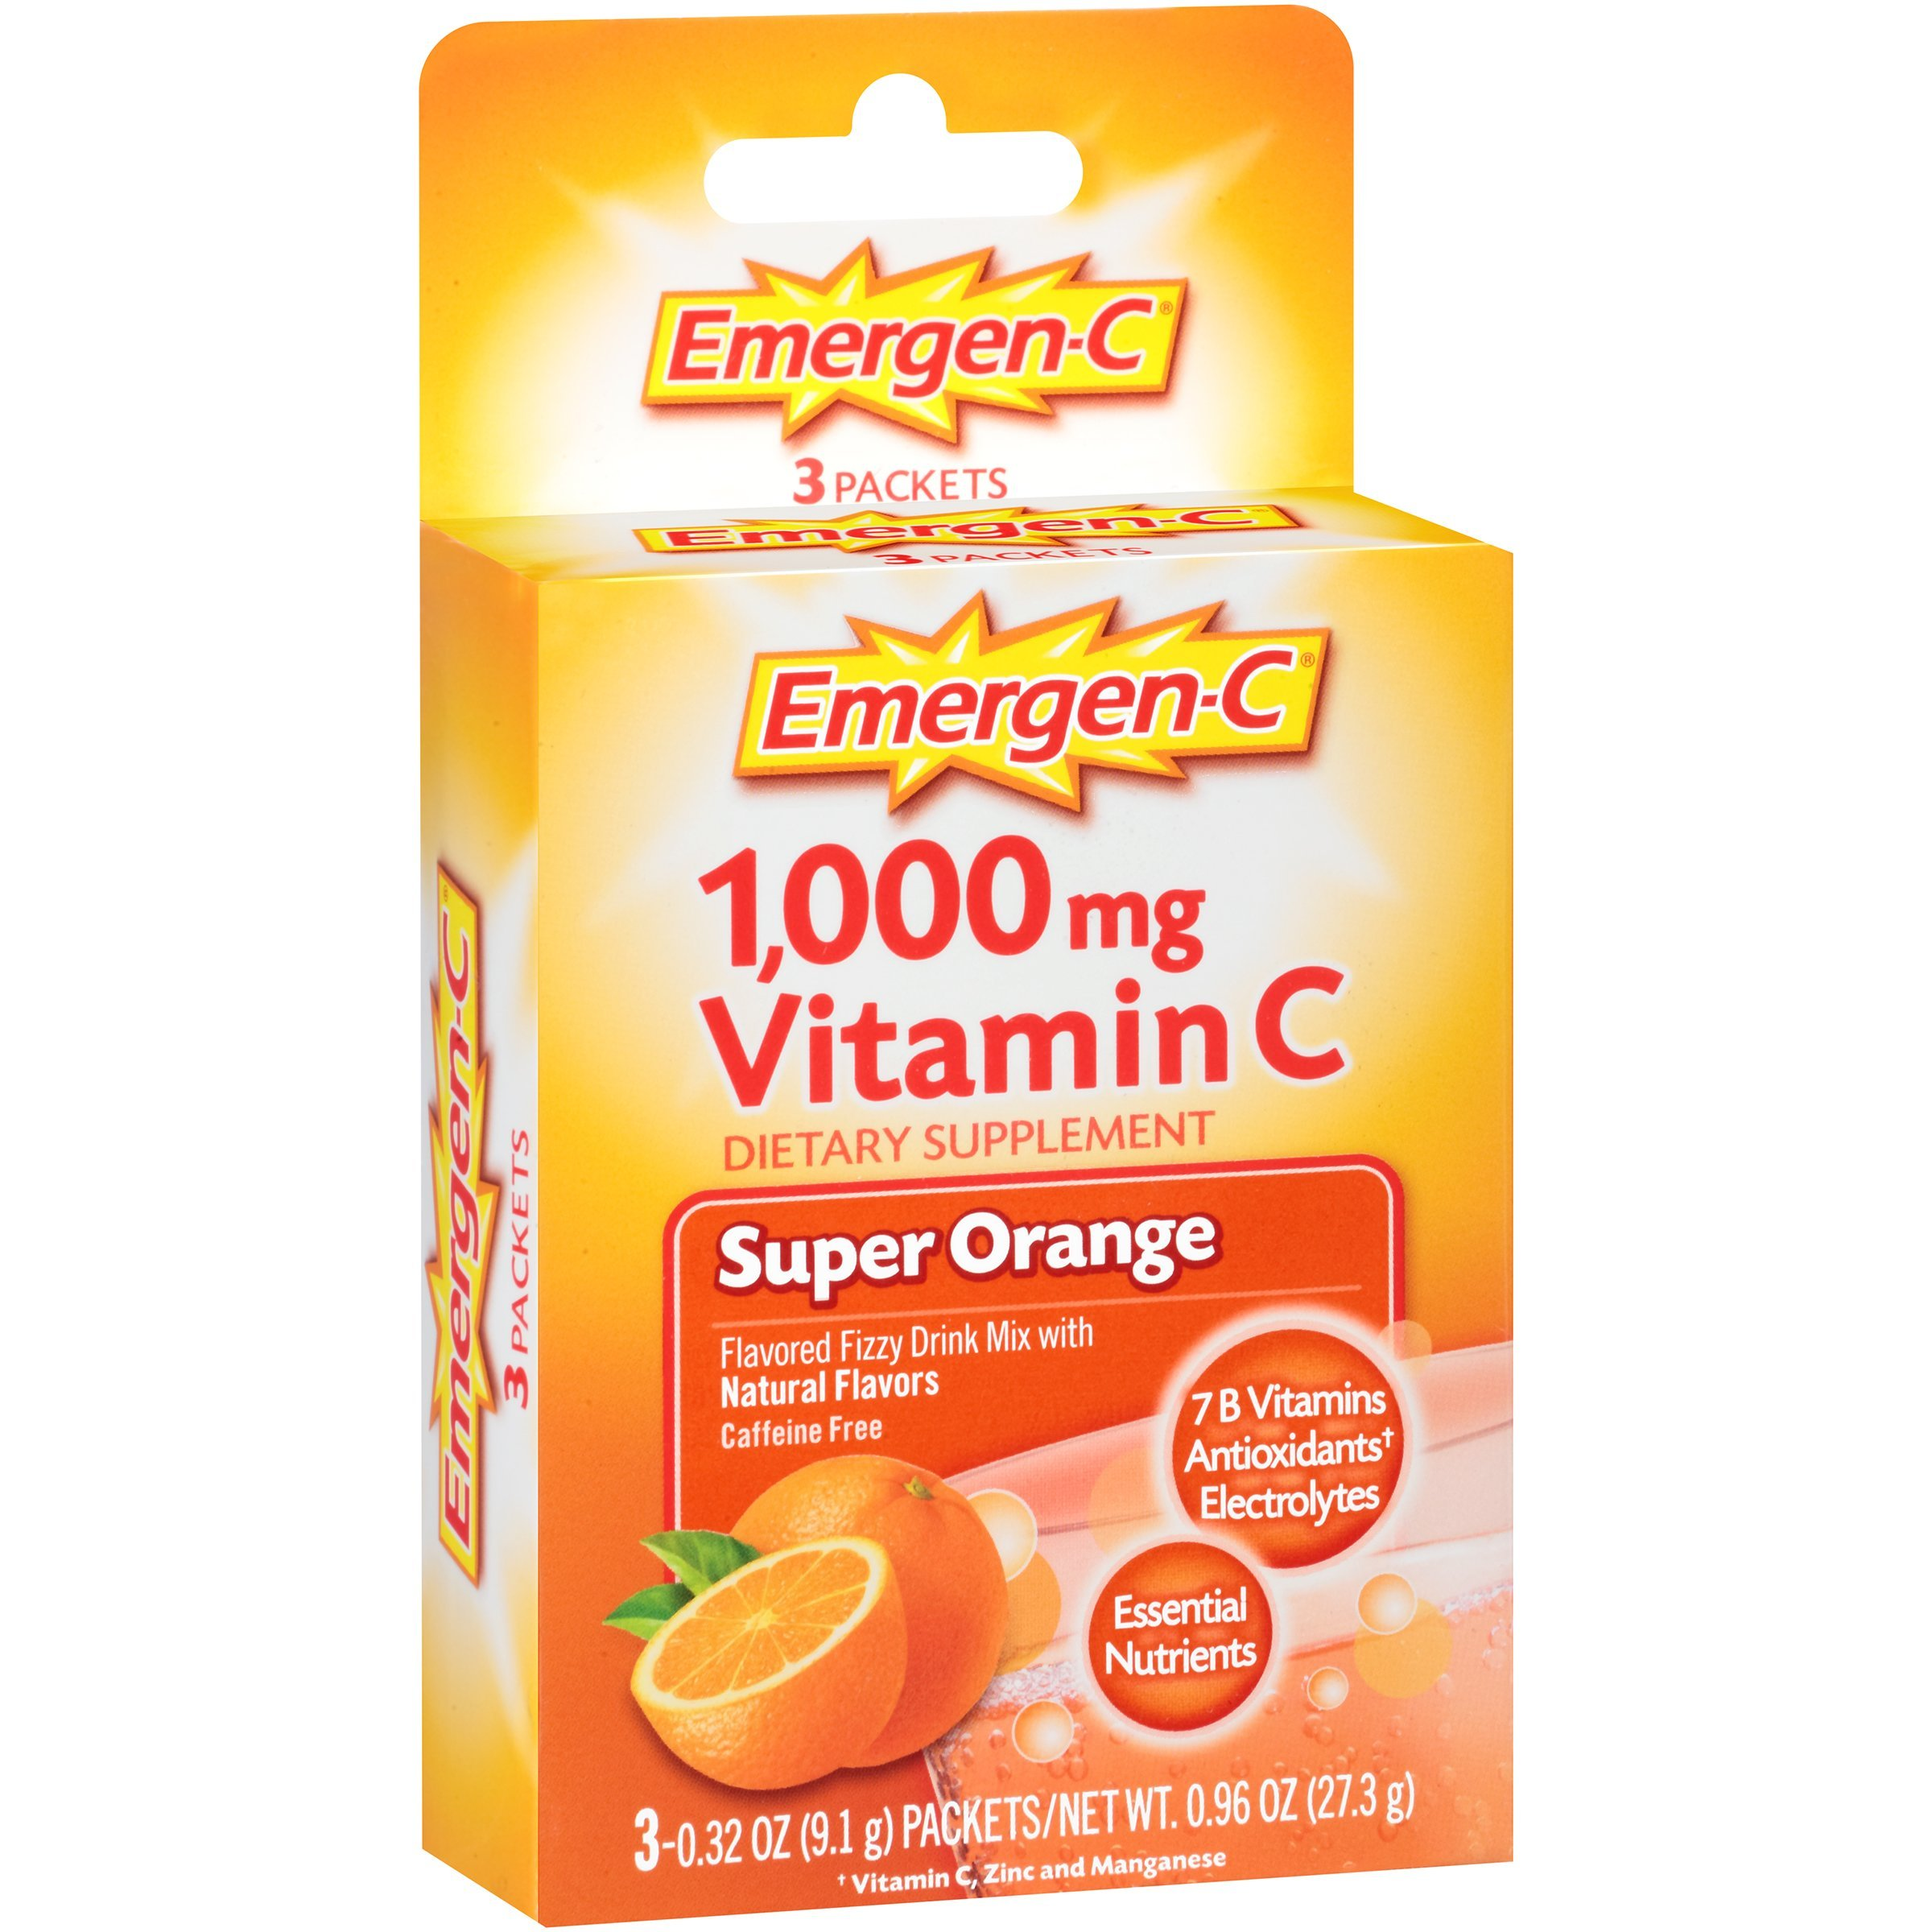 Emergen-C Dietary Supplement with 1000mg Vitamin C, Super Orange Flavor, 3 Count, 0.32 Ounce